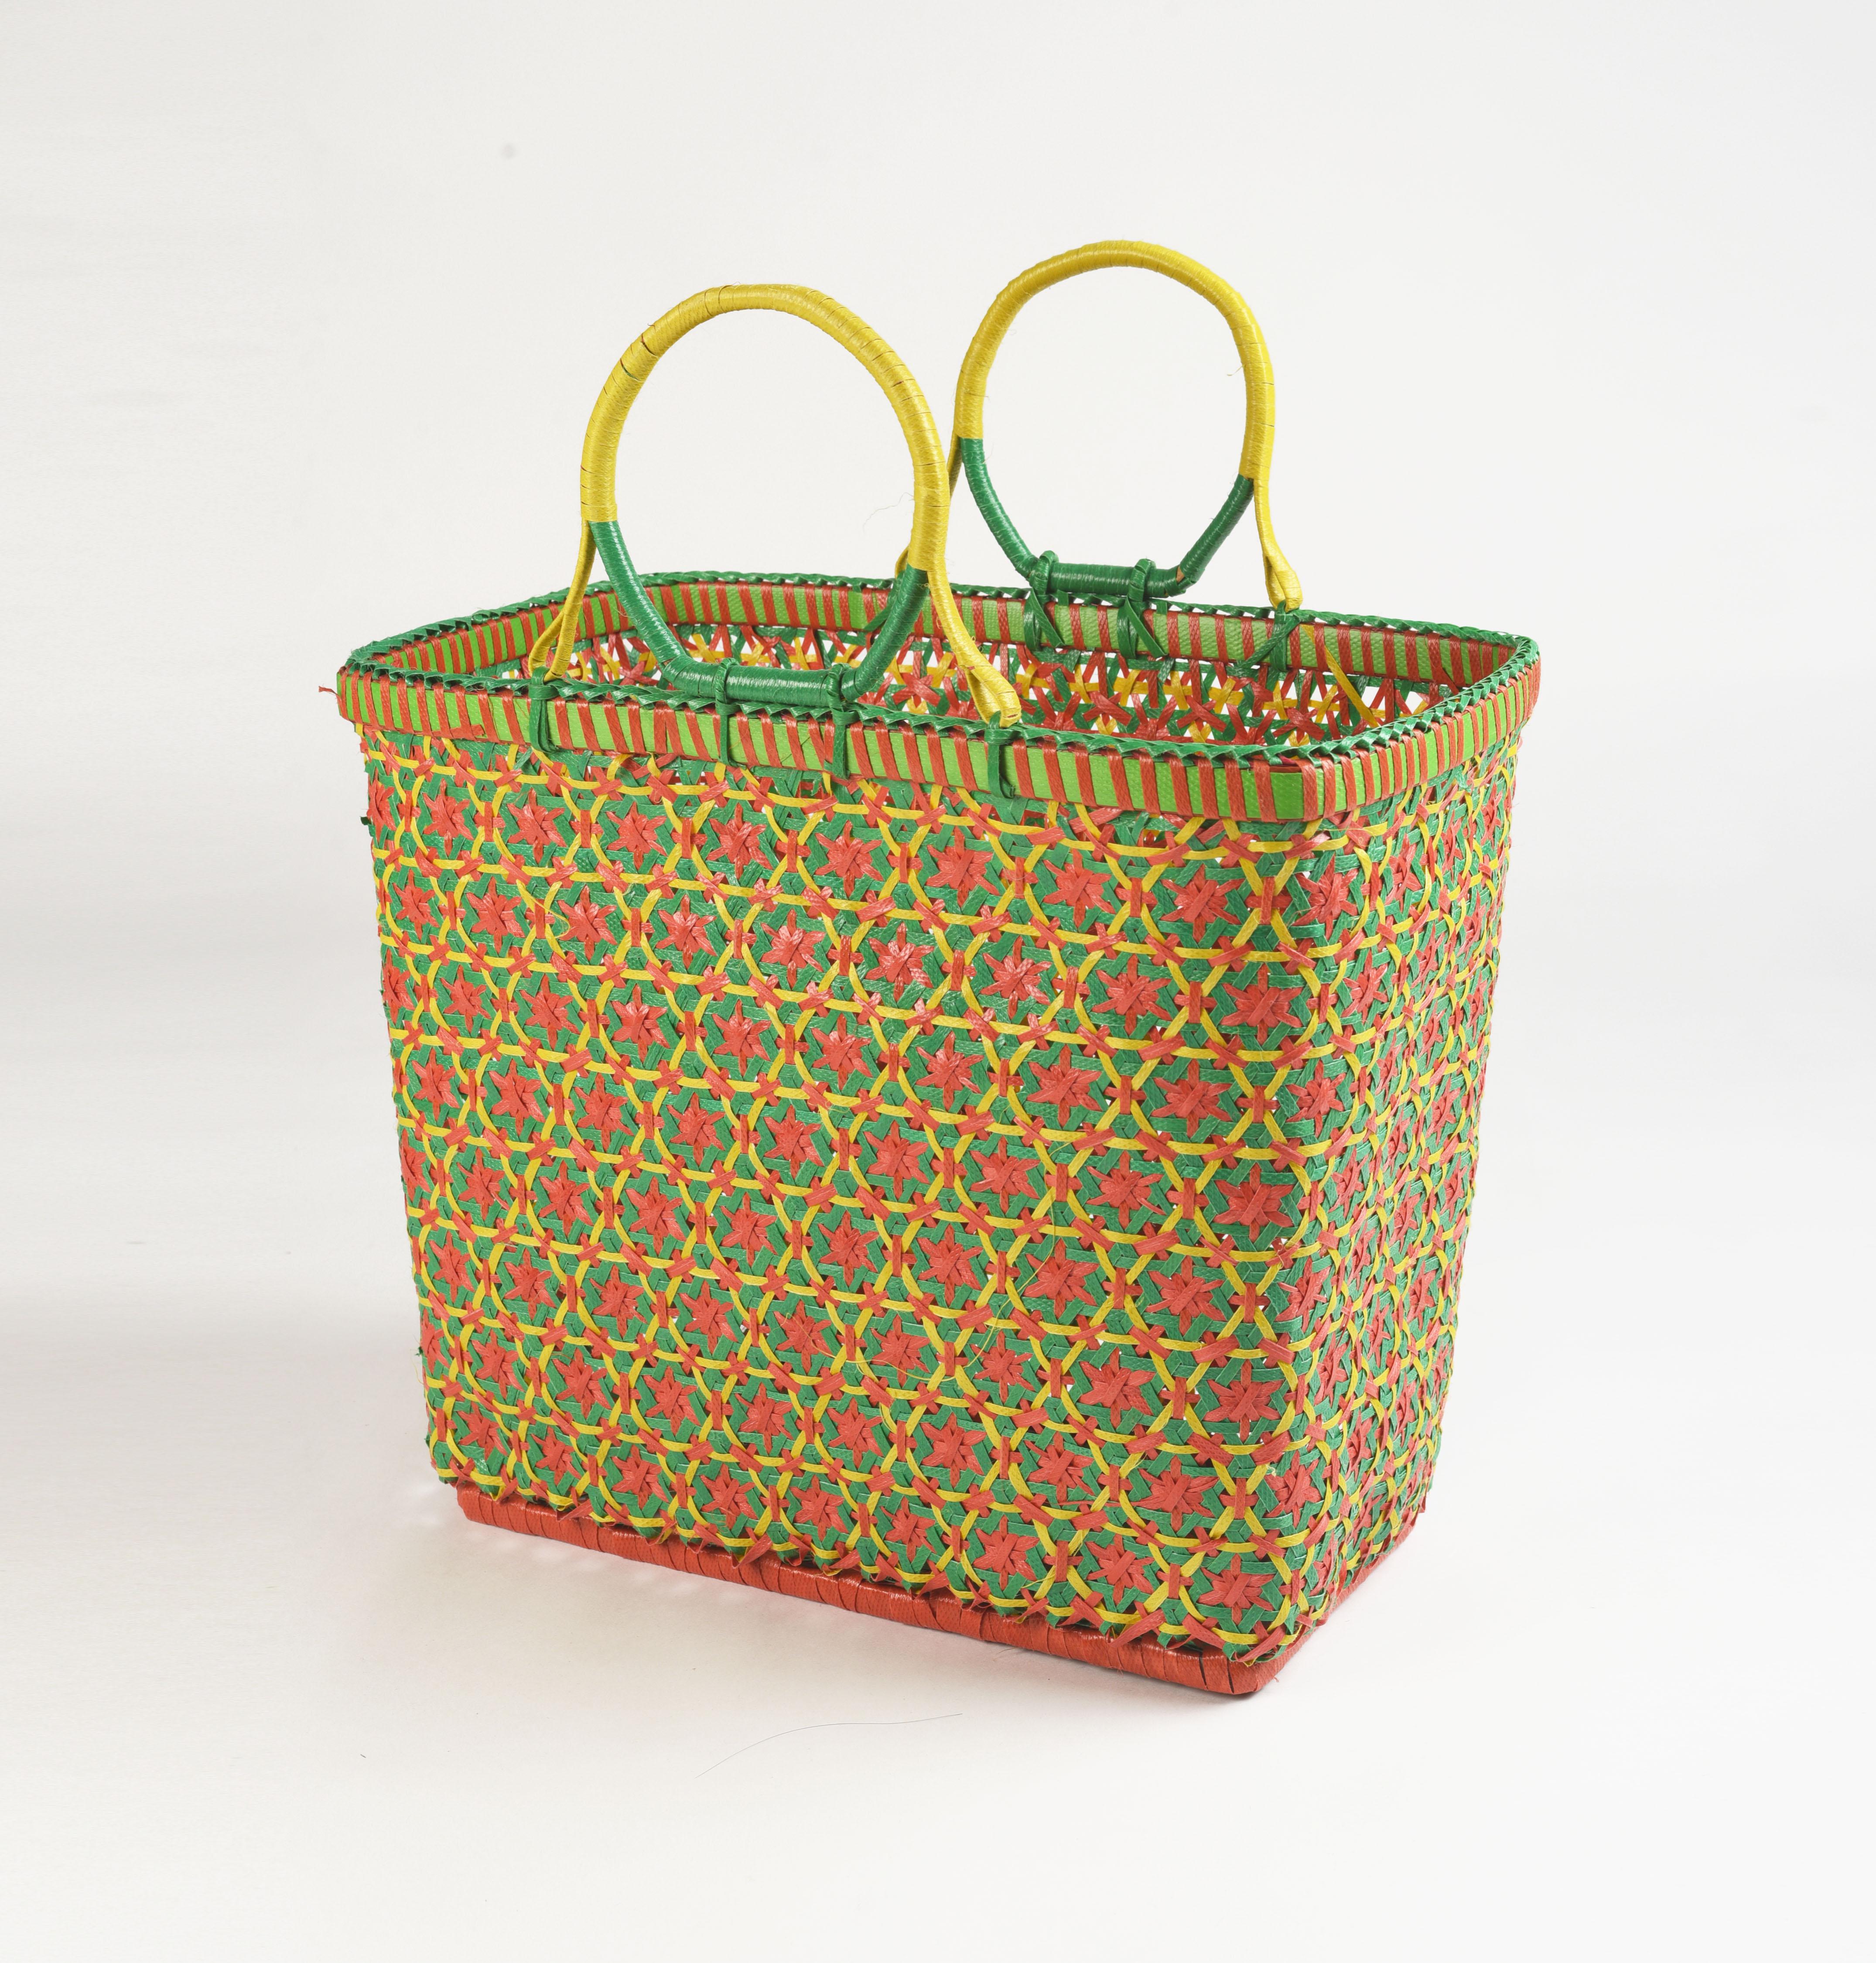 Recycled plastic basket, handmade basket, multicolour, yellow colour, beach basket, picnic basket